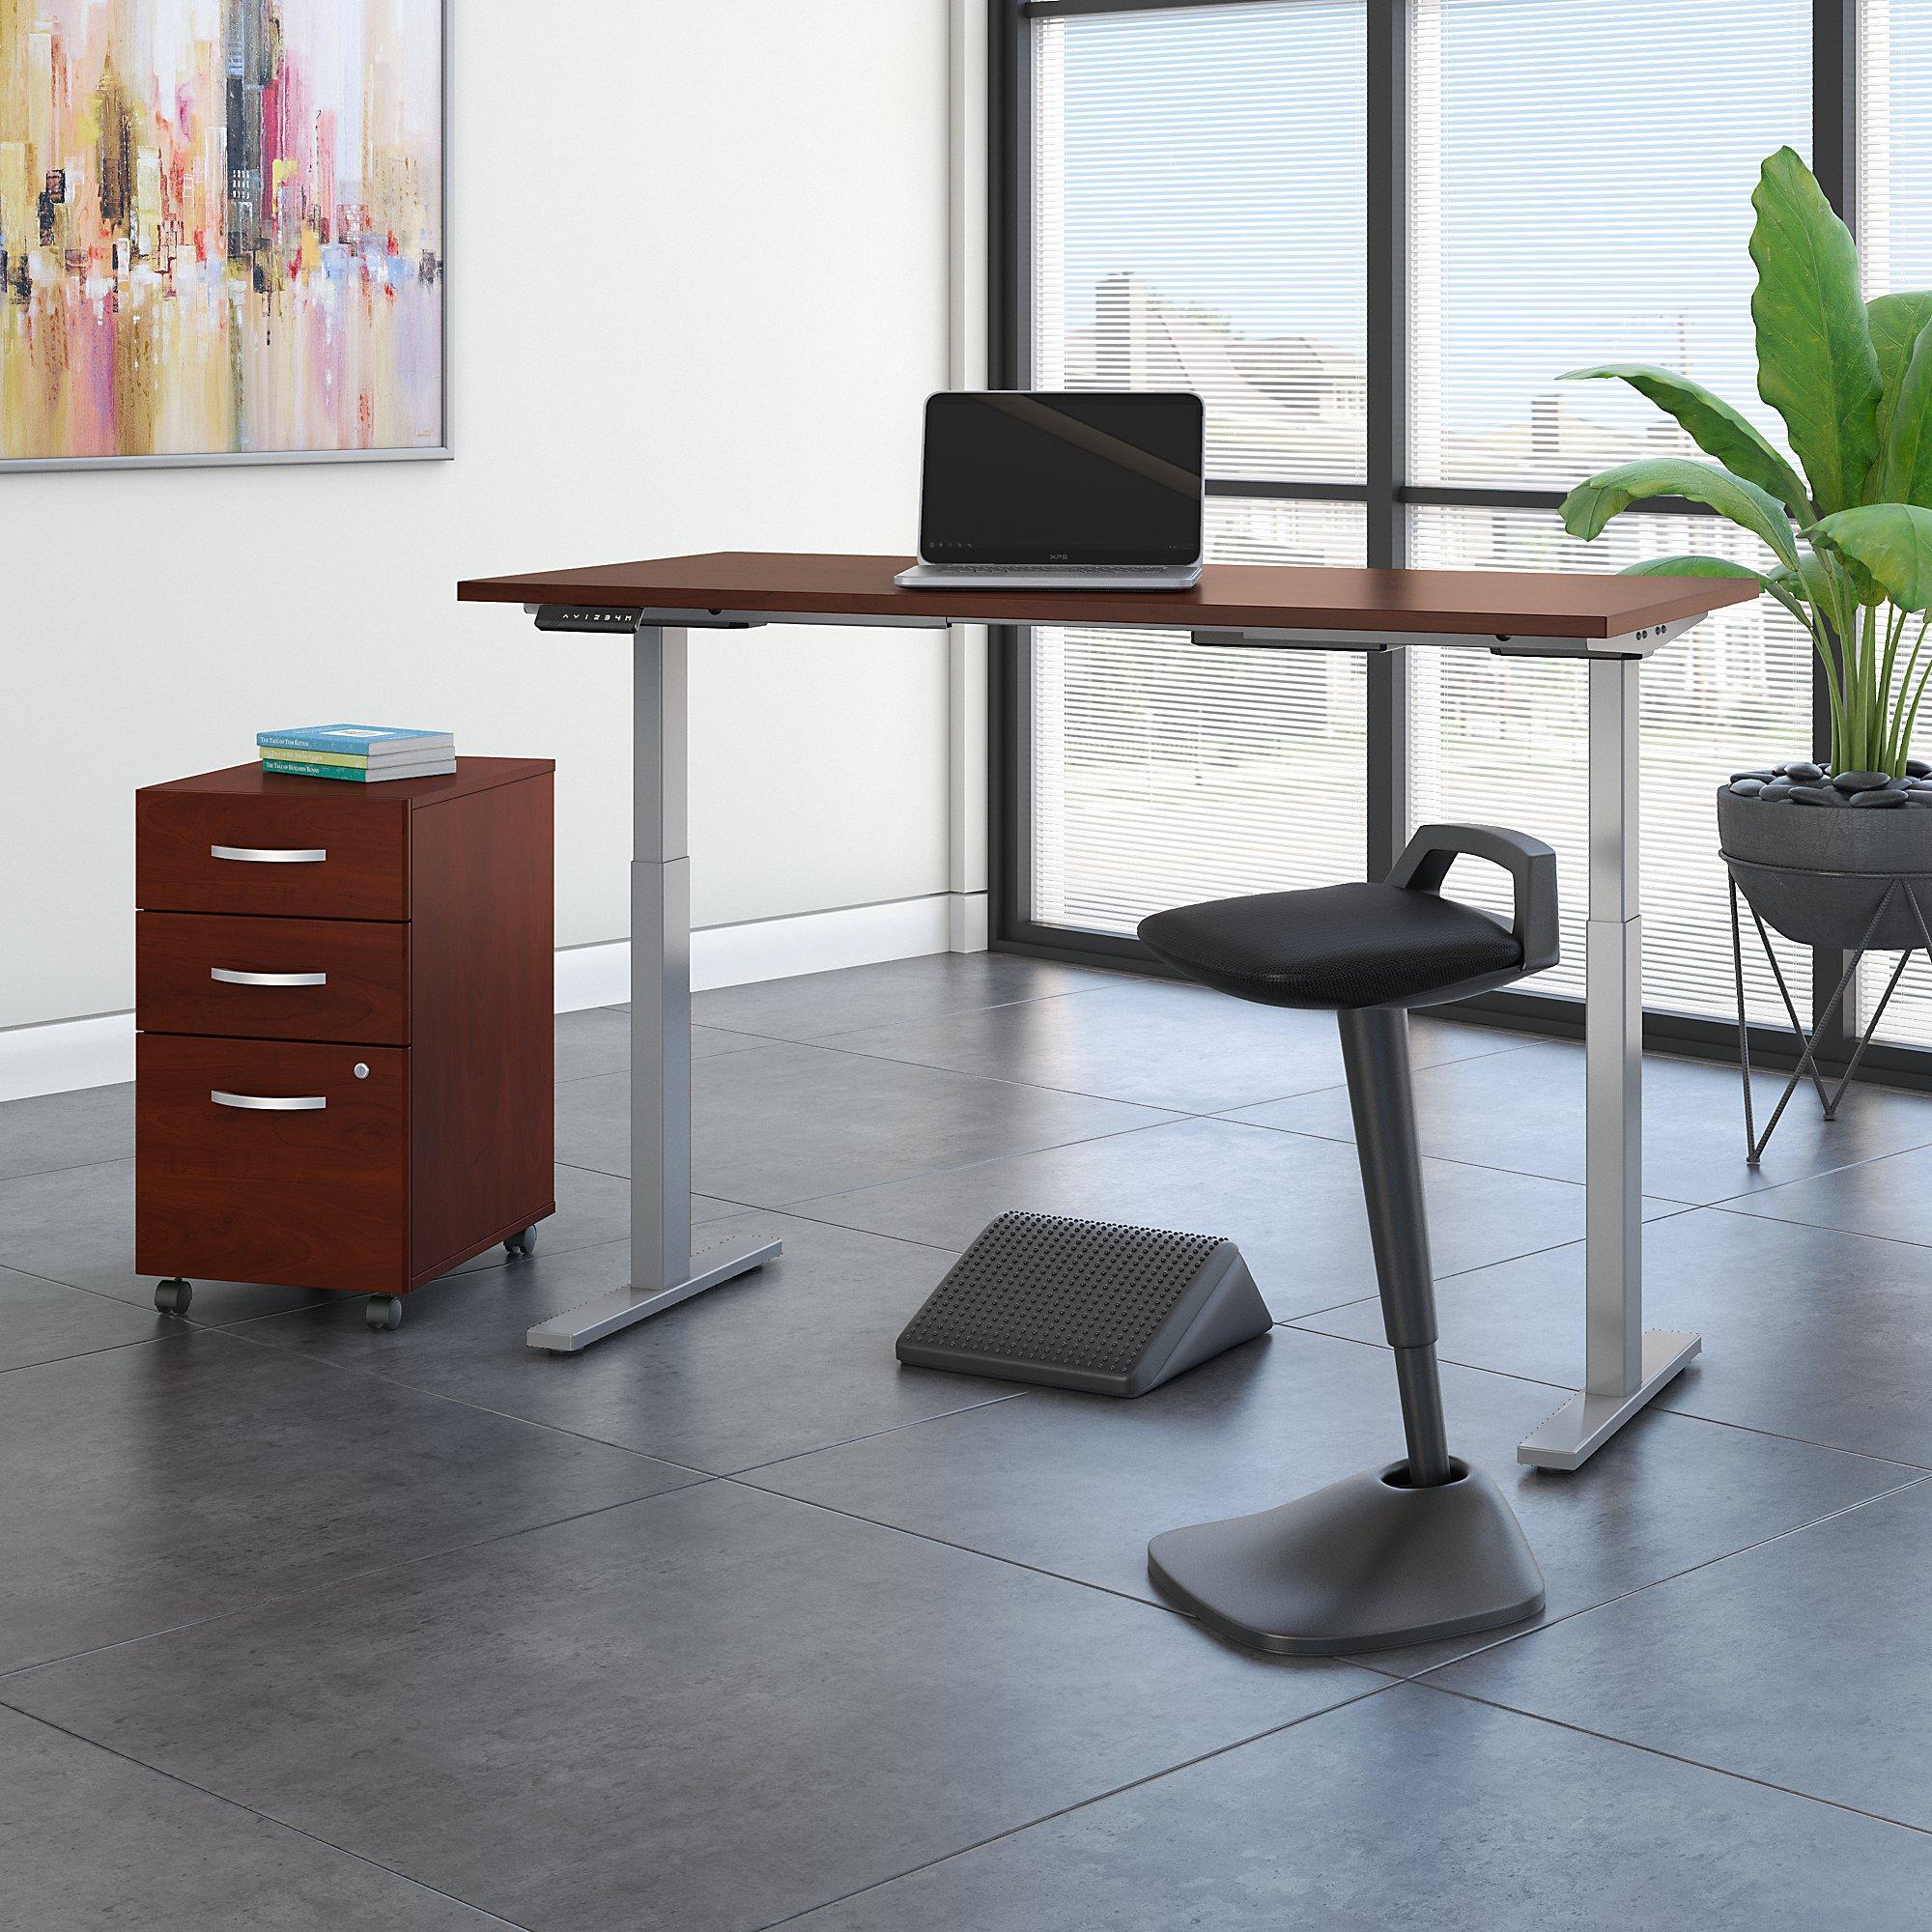 hansen cherry ergonomic furniture set